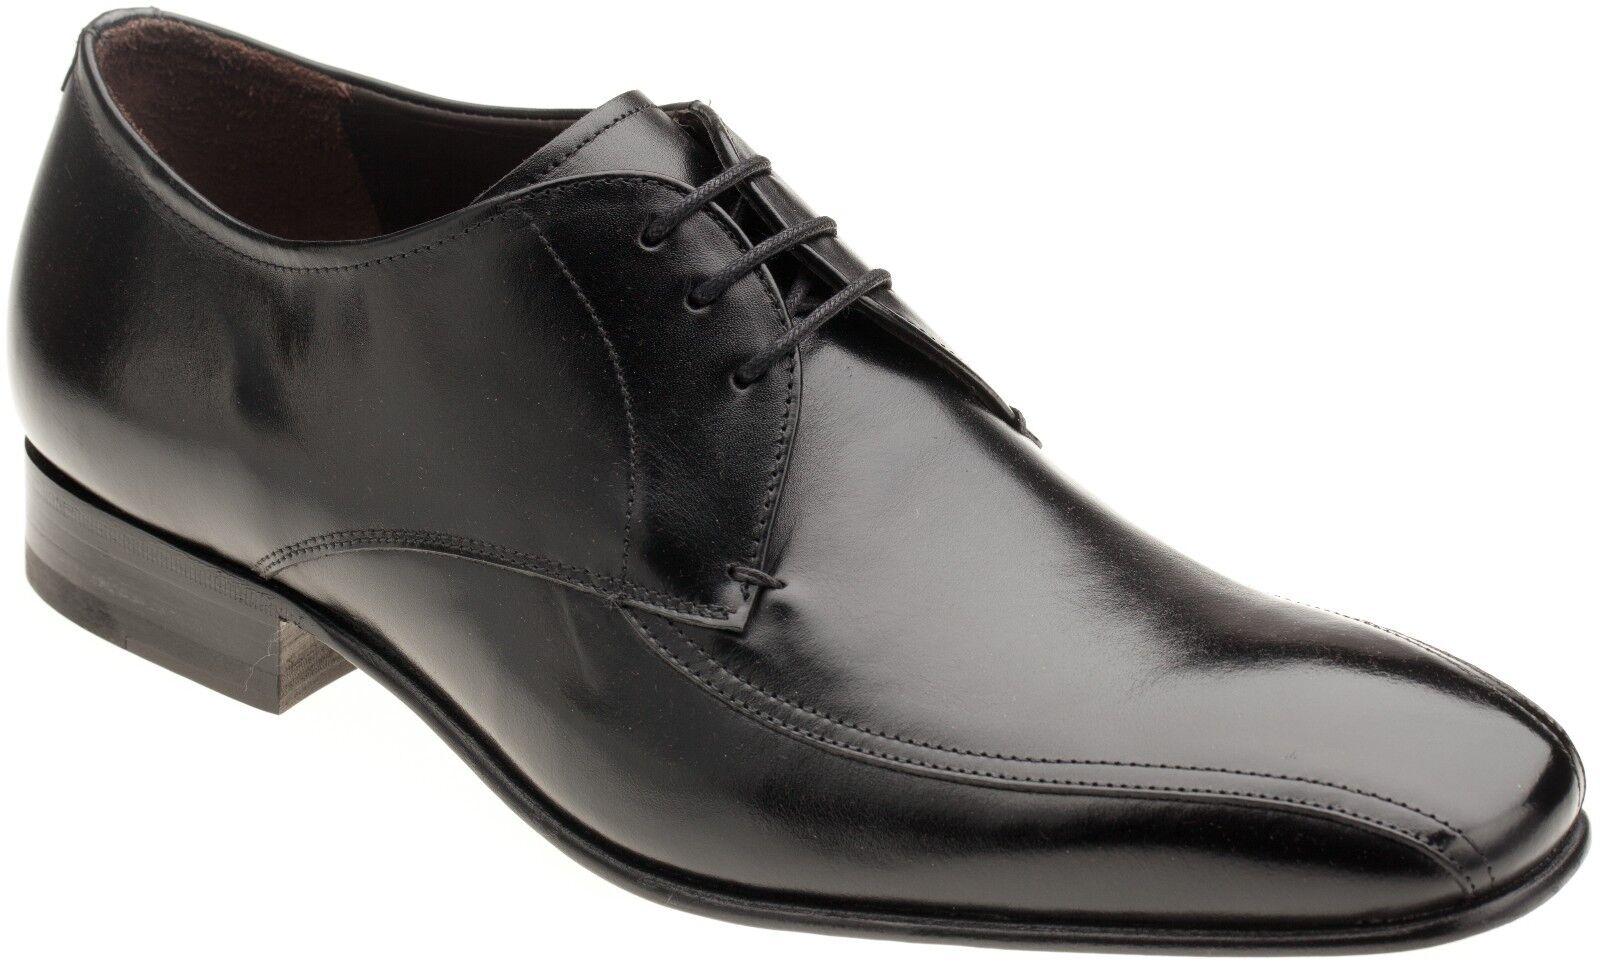 Mezlan Herren 12920 Schwarzes Schwarzes Schwarzes Leder Oxford Formelle Schuhe 2822ad